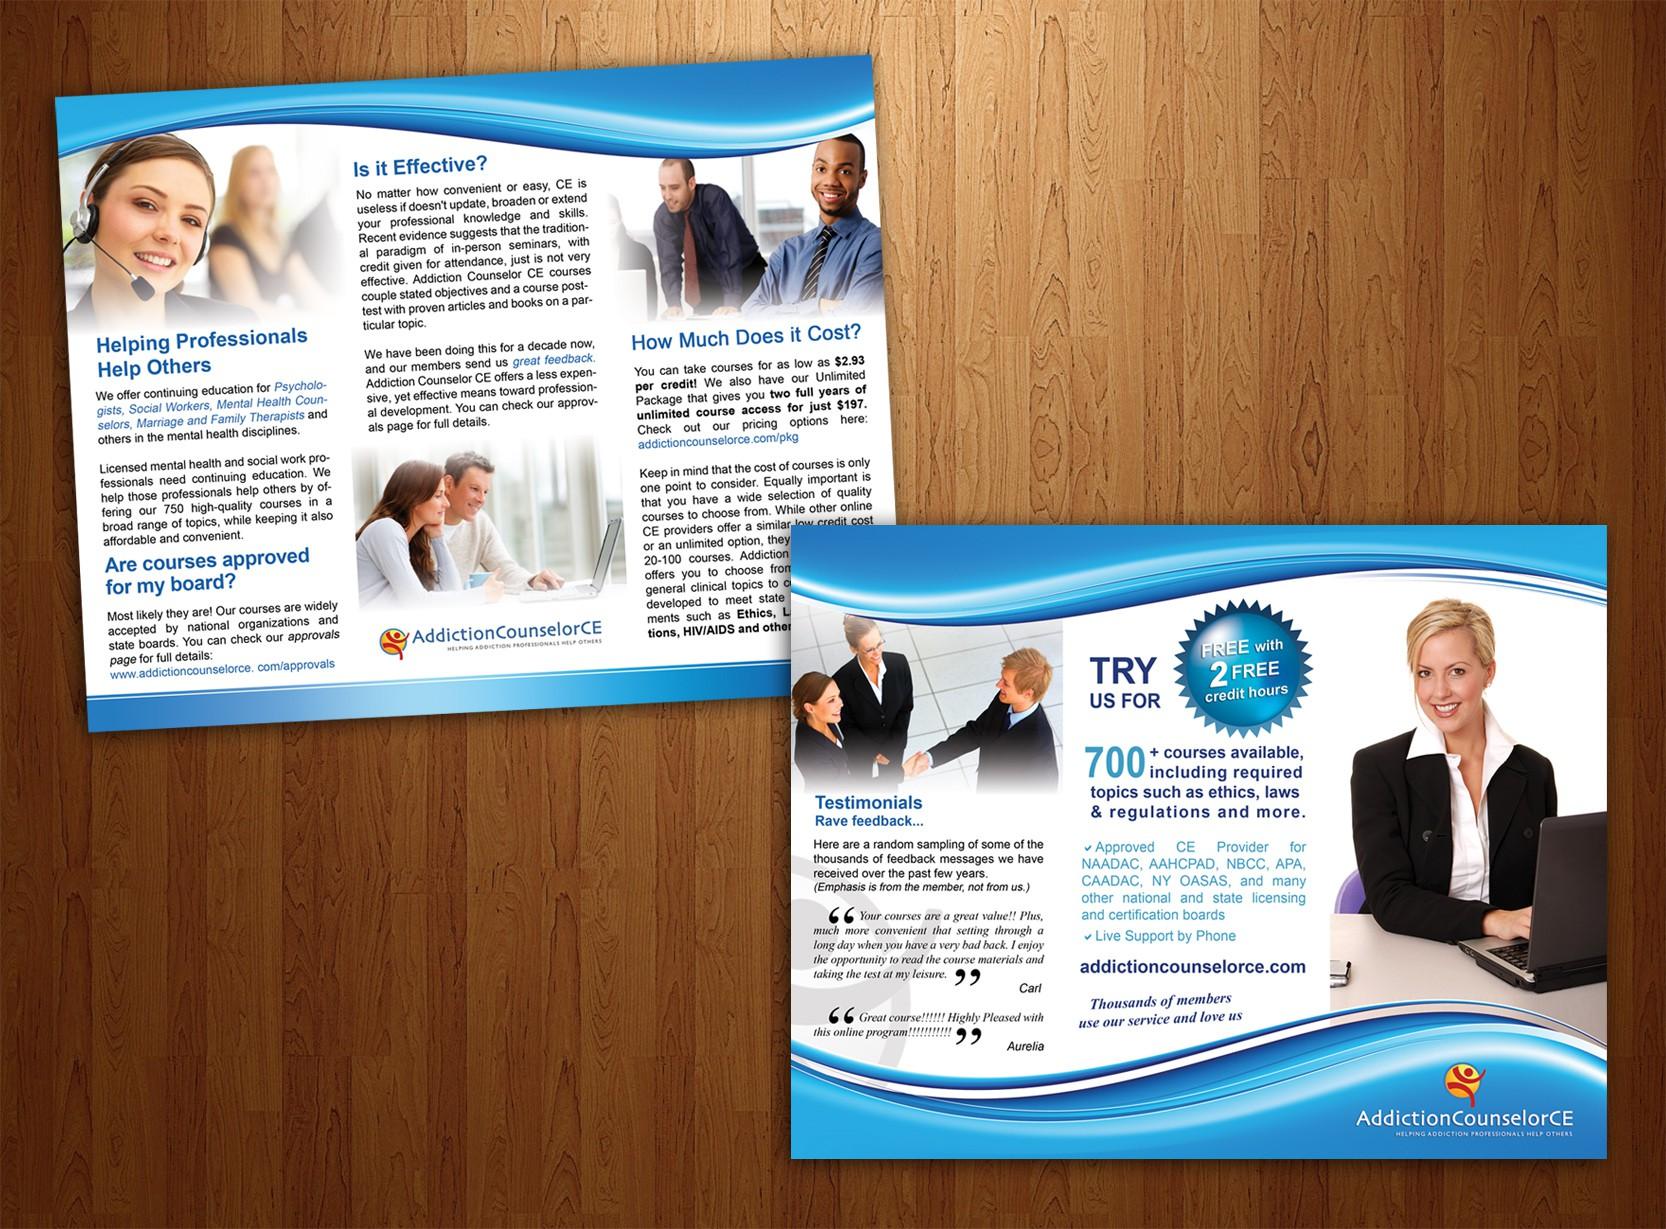 Create trifold brochure for AddictionCounselorCE.com